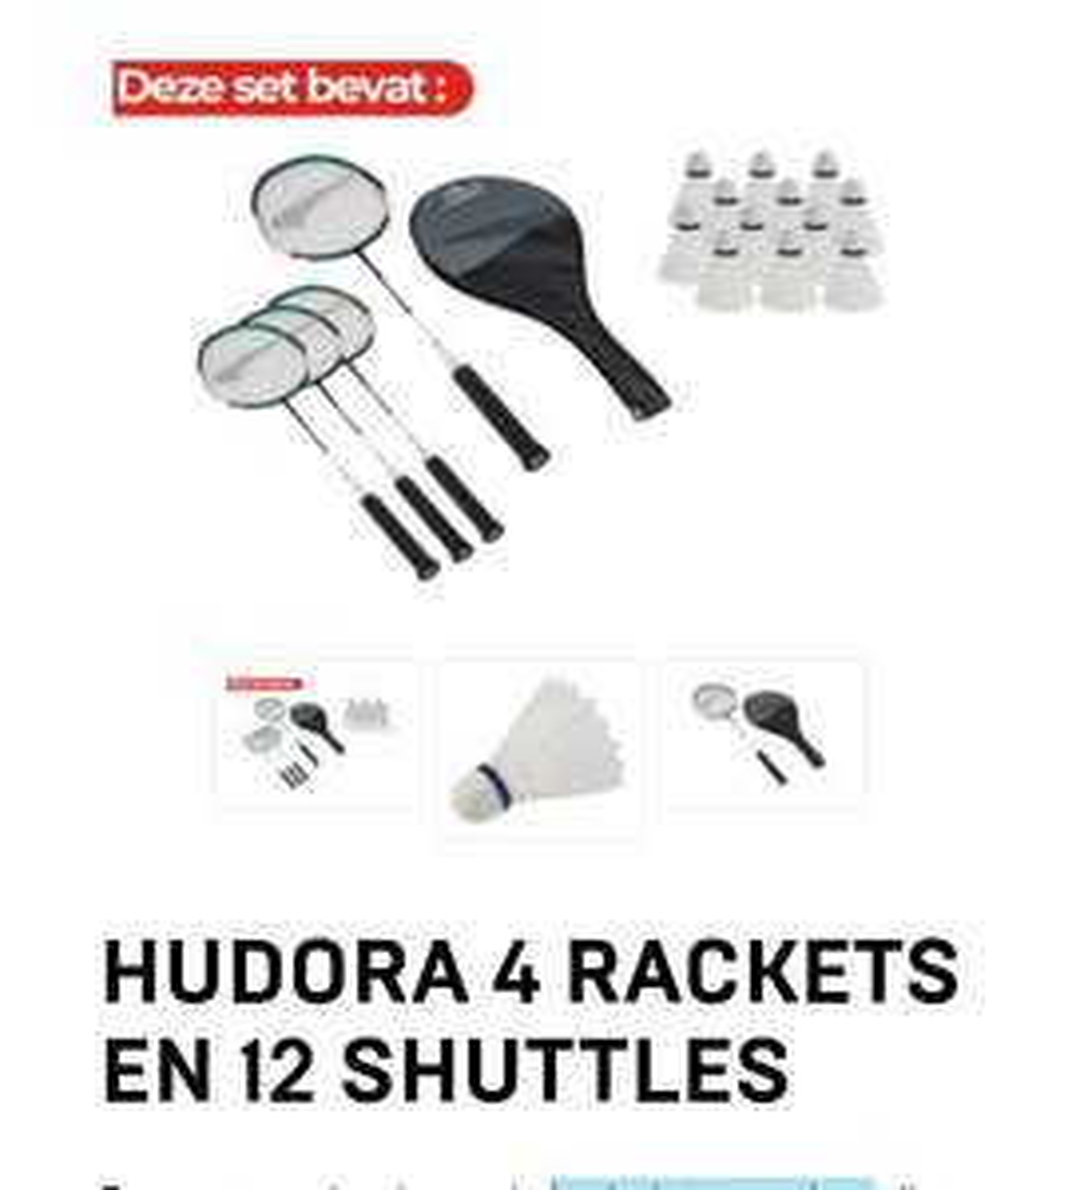 Hudora 4 Rackets en 12 Shuttles